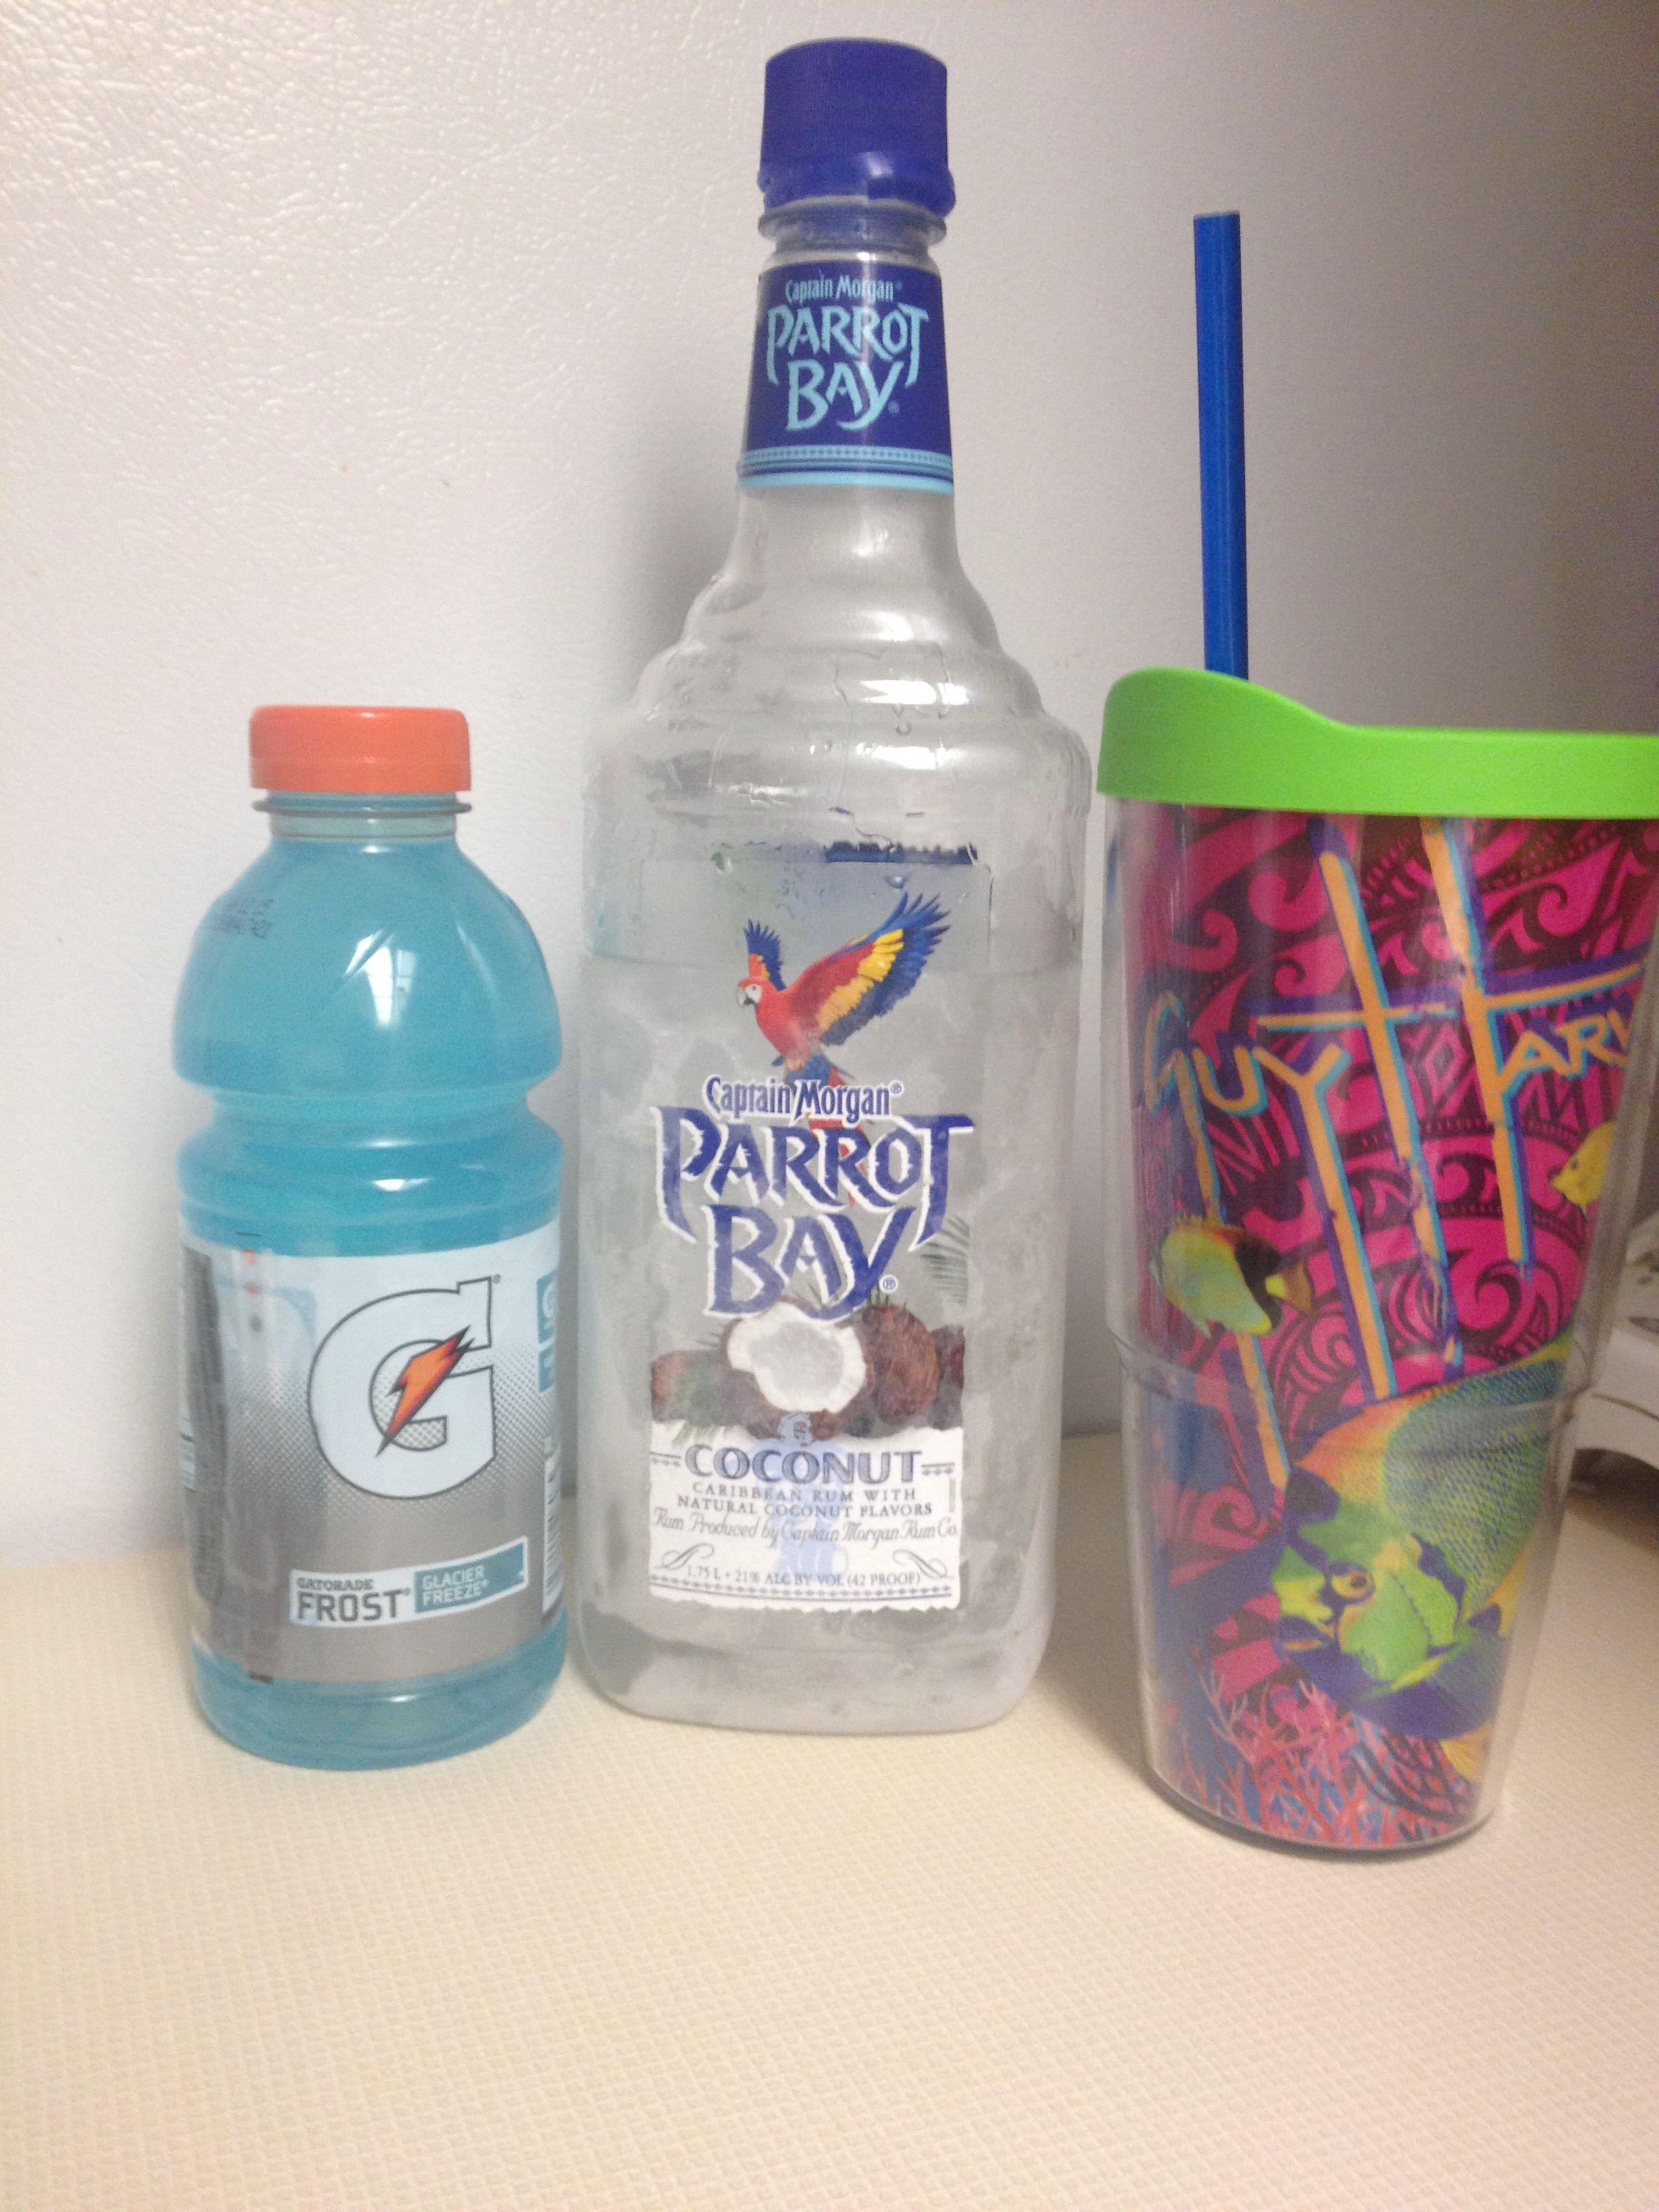 Blue Crush Coconut Rum Frost Gatorade And Put It Over Ice E Juice Liquid Frosty Juiceango Apple Original 100 Not Ejm Juliana